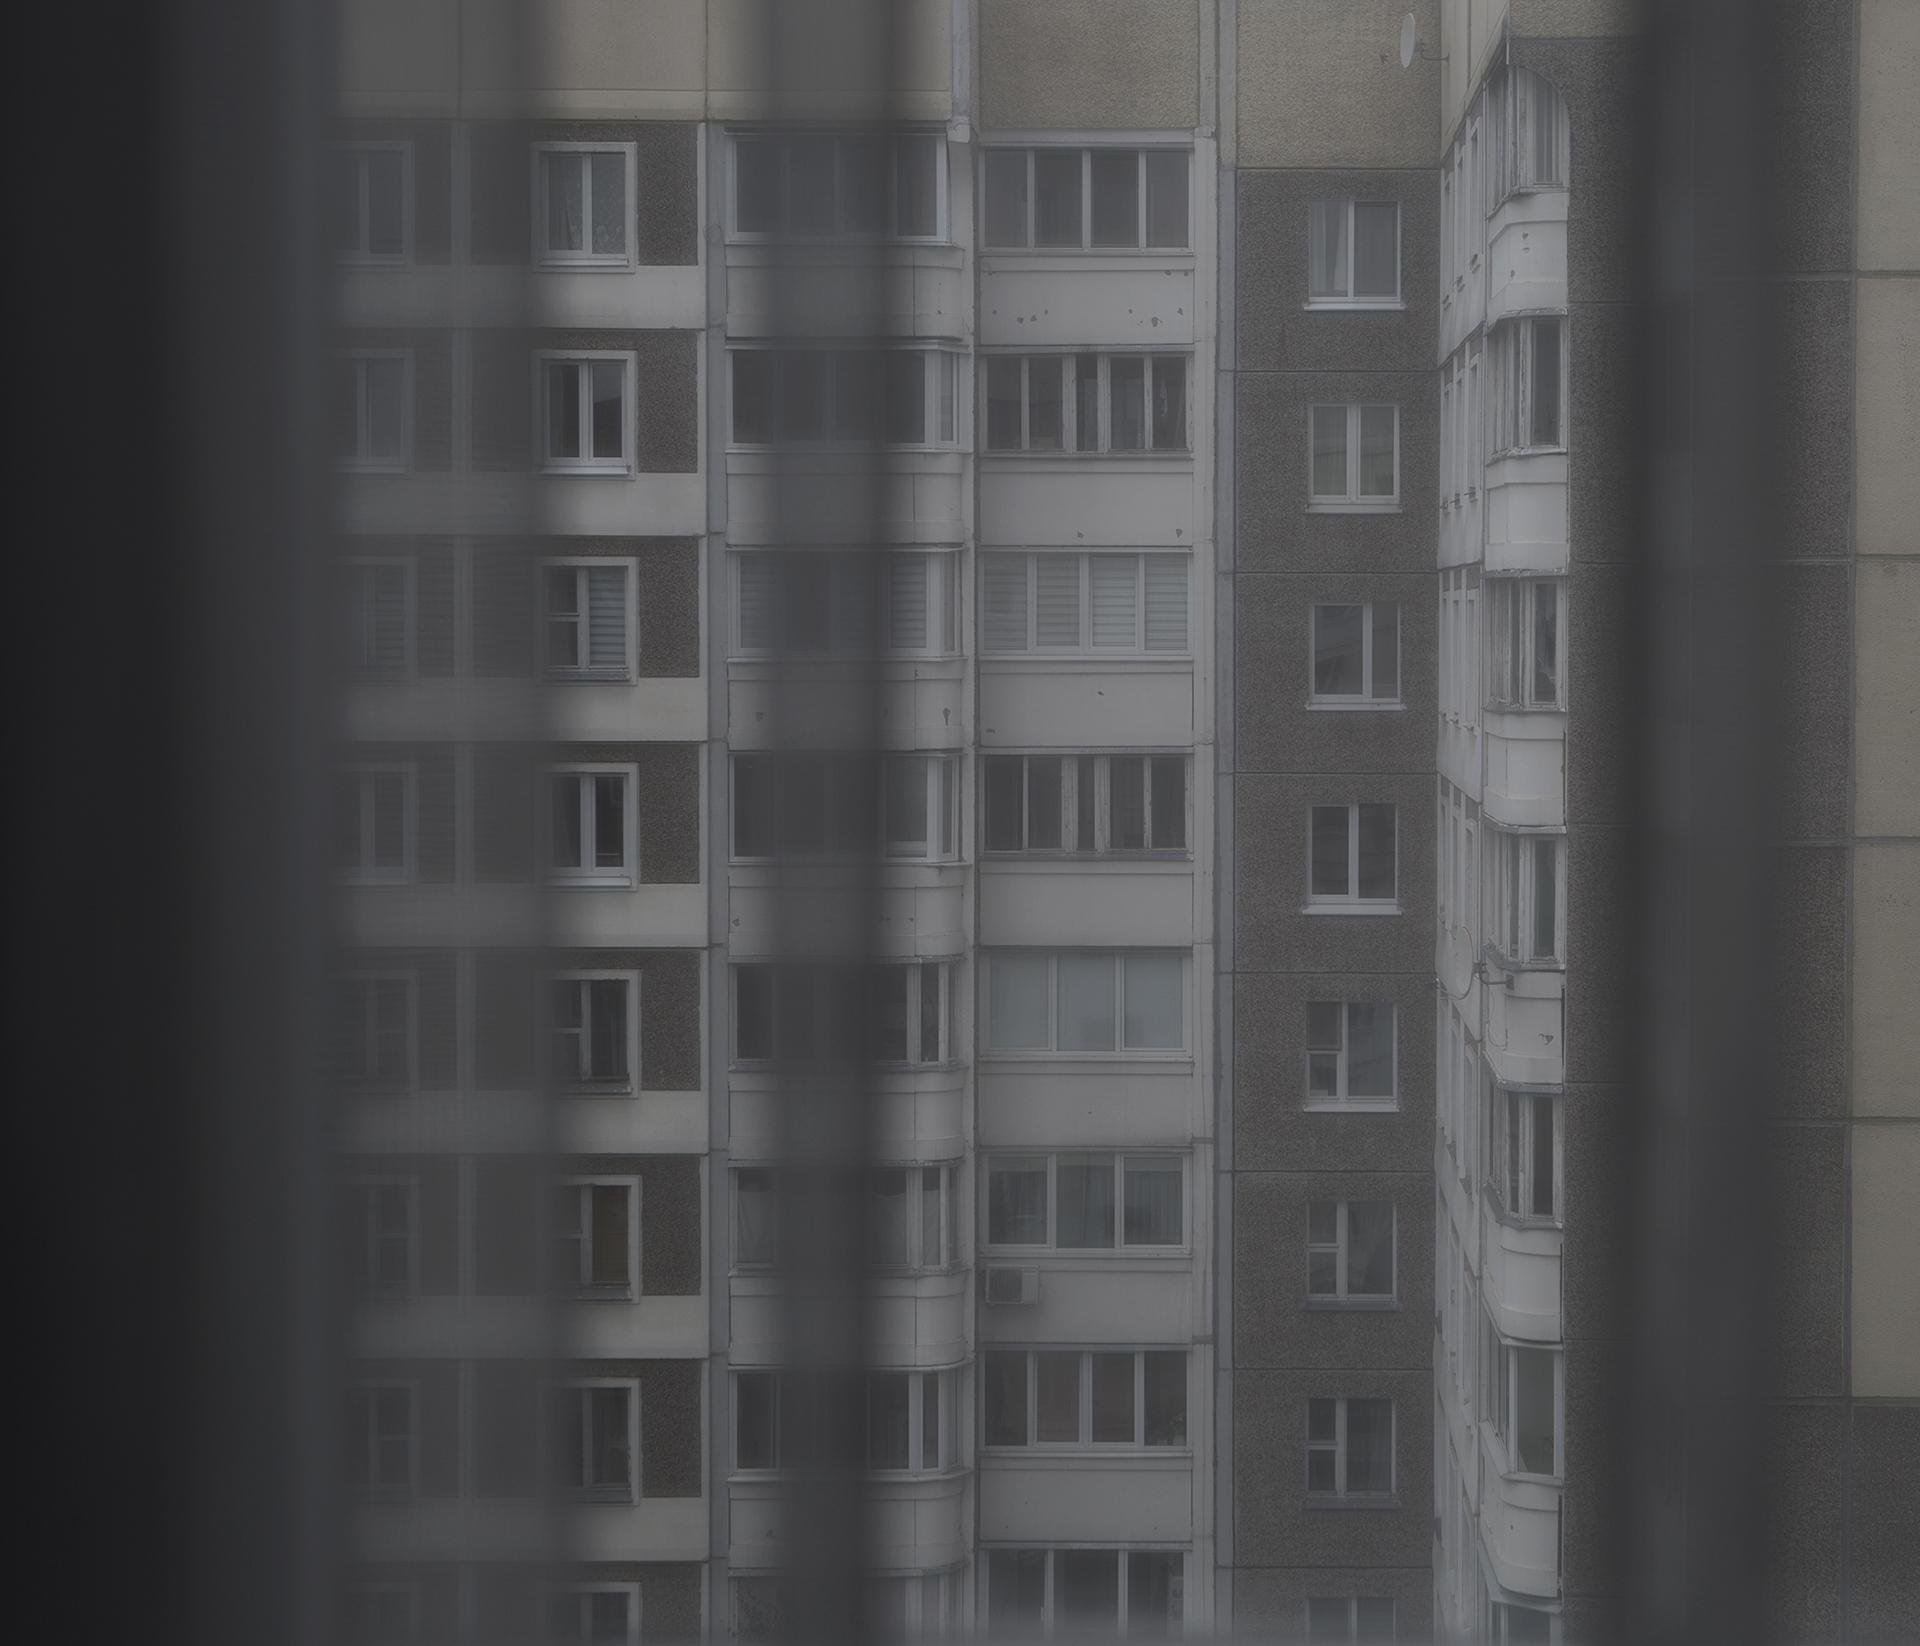 jadwiga bronte.old red.belarus.misk.soviet union.grey day.window.block of flats.jpg